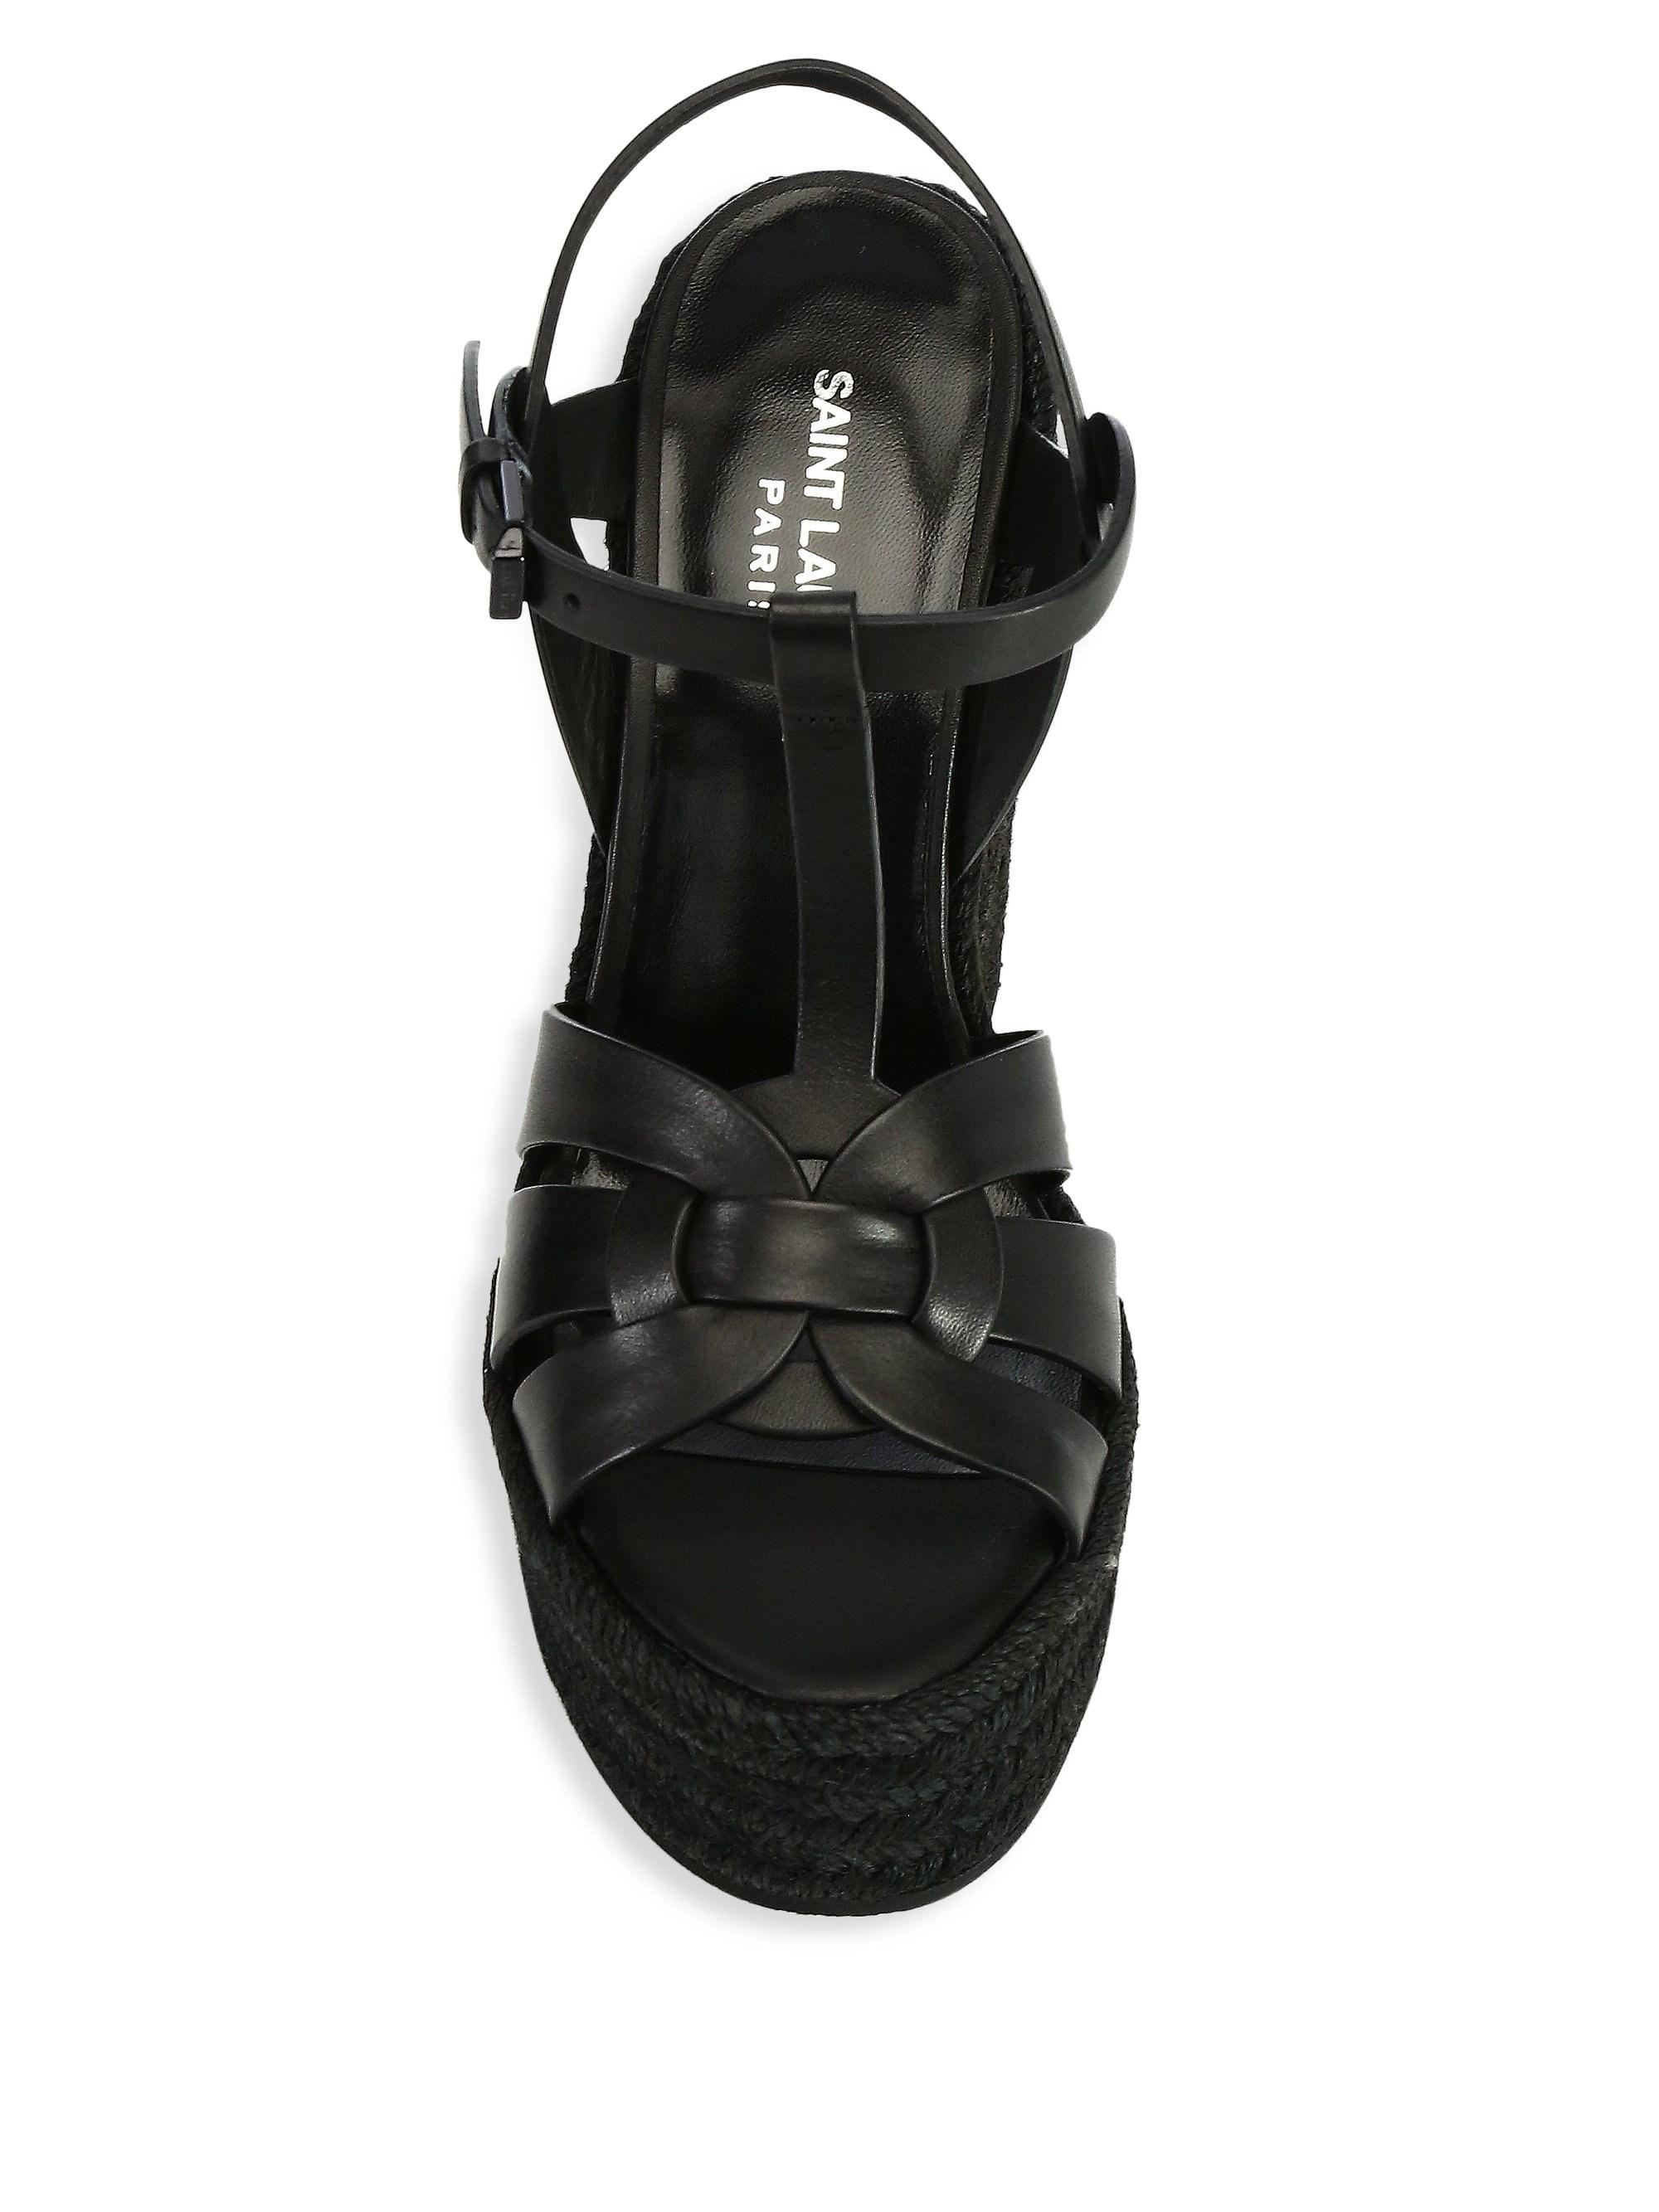 a0c3c9f578d98 Saint Laurent - Black Wedge Sandals St - Lyst. View fullscreen